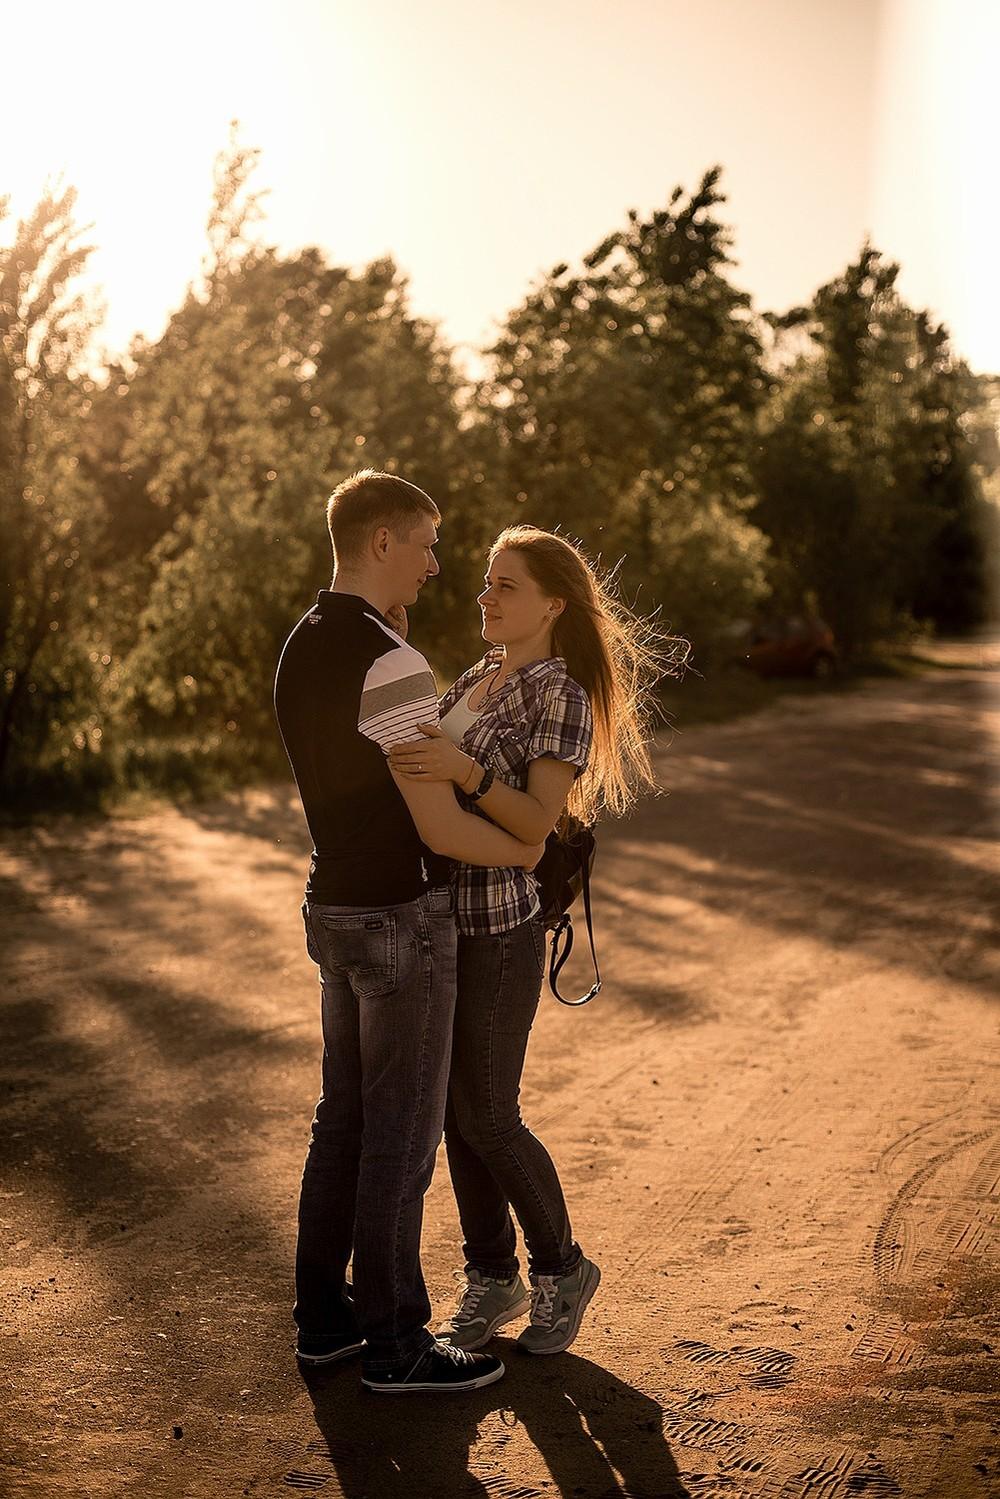 Свадебная фотосъемка и лав стори - Предсвадебная съёмка, июнь 2019